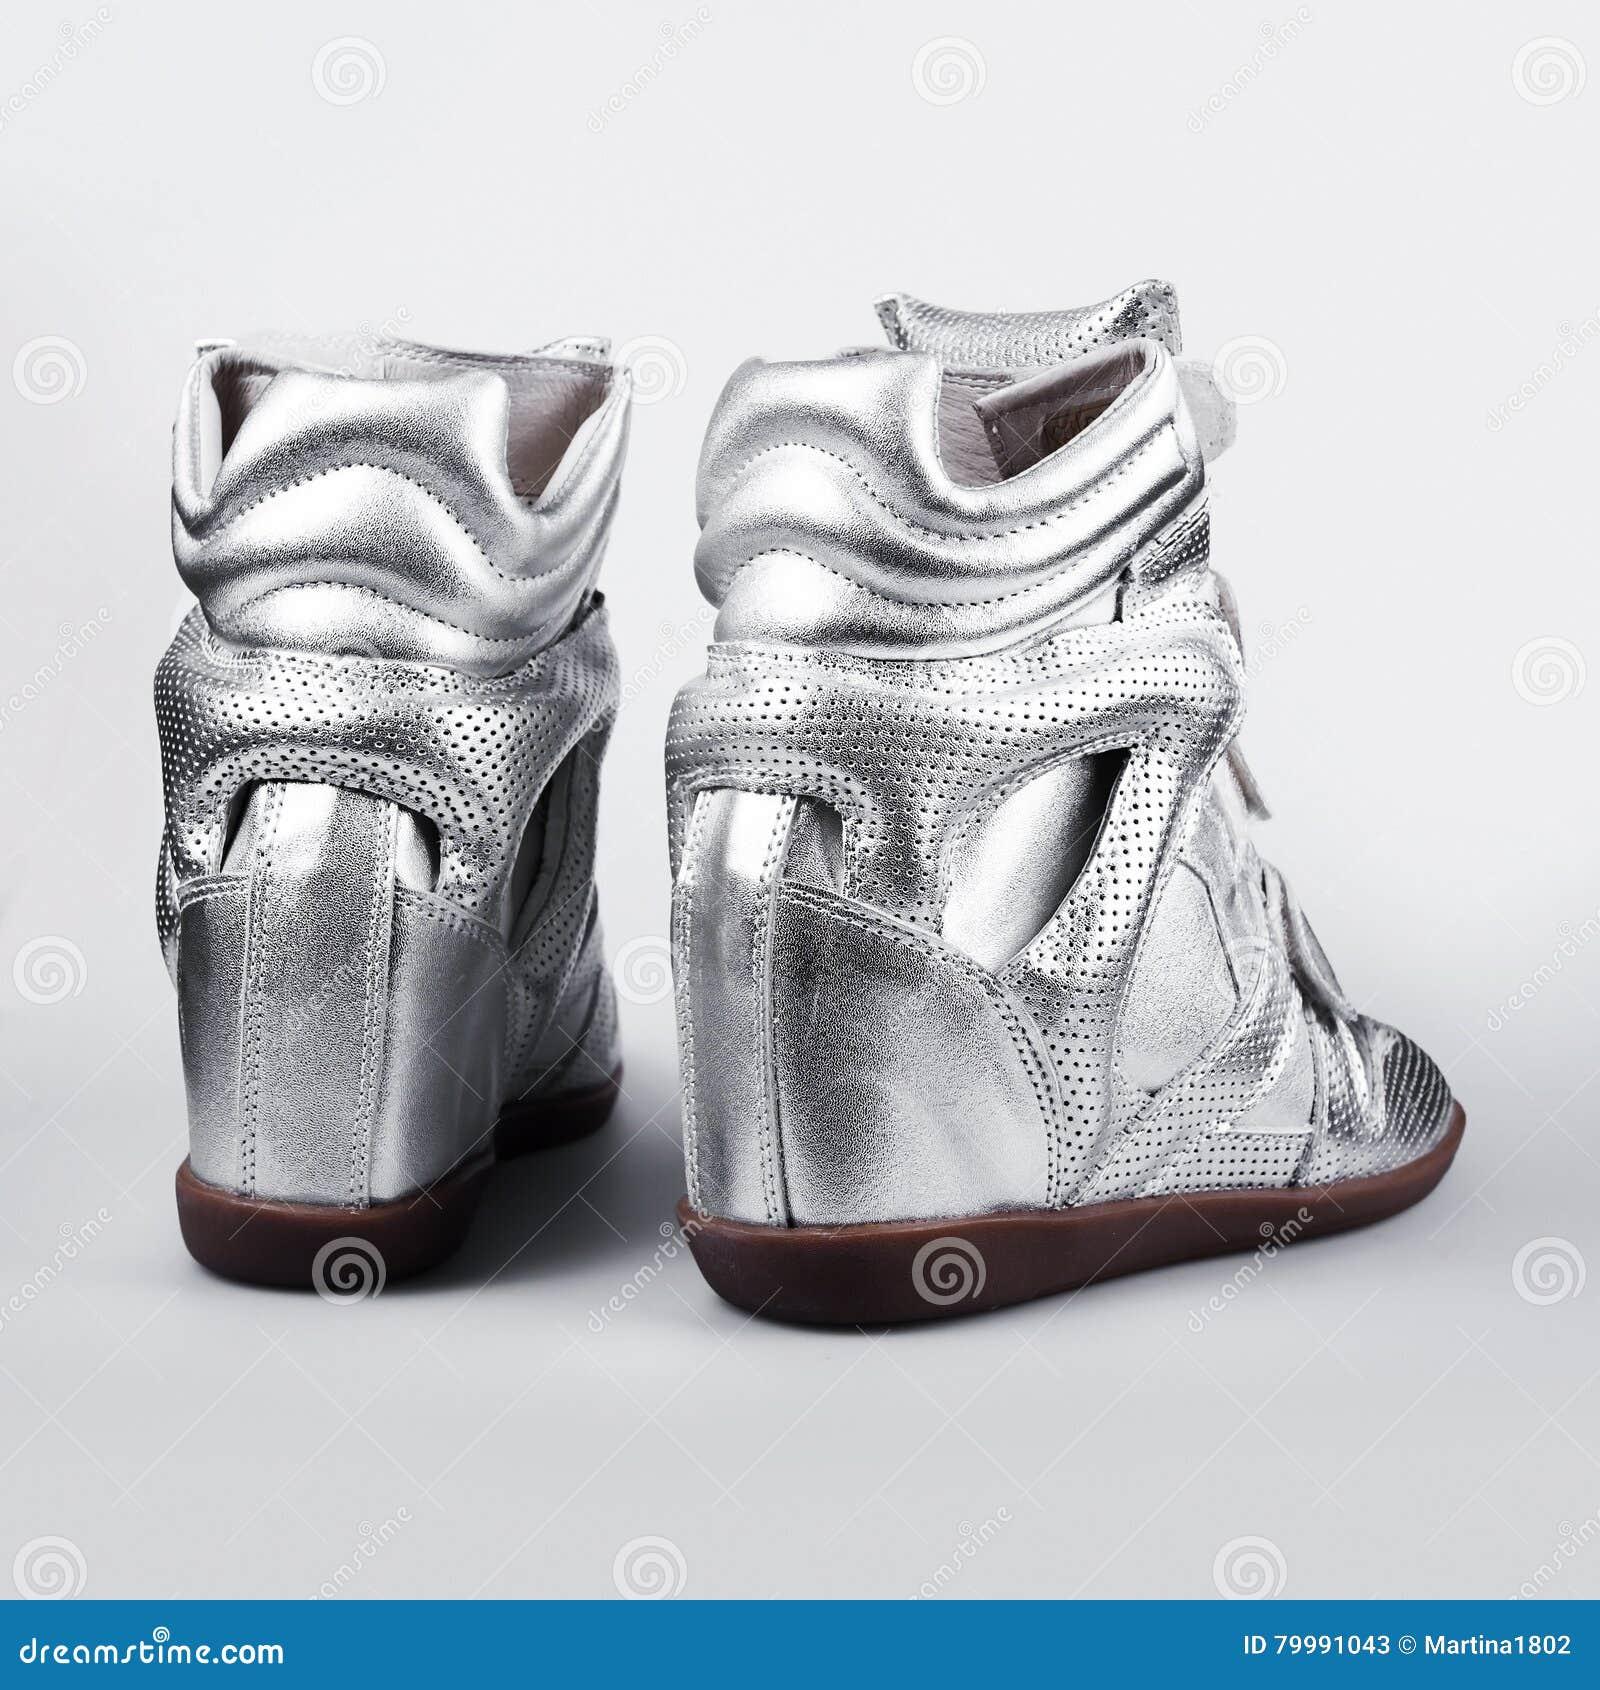 f75a41551f6 Ασημένιες γυναίκες παπουτσιών παπουτσιών ιταλικές Στοκ Εικόνα ...